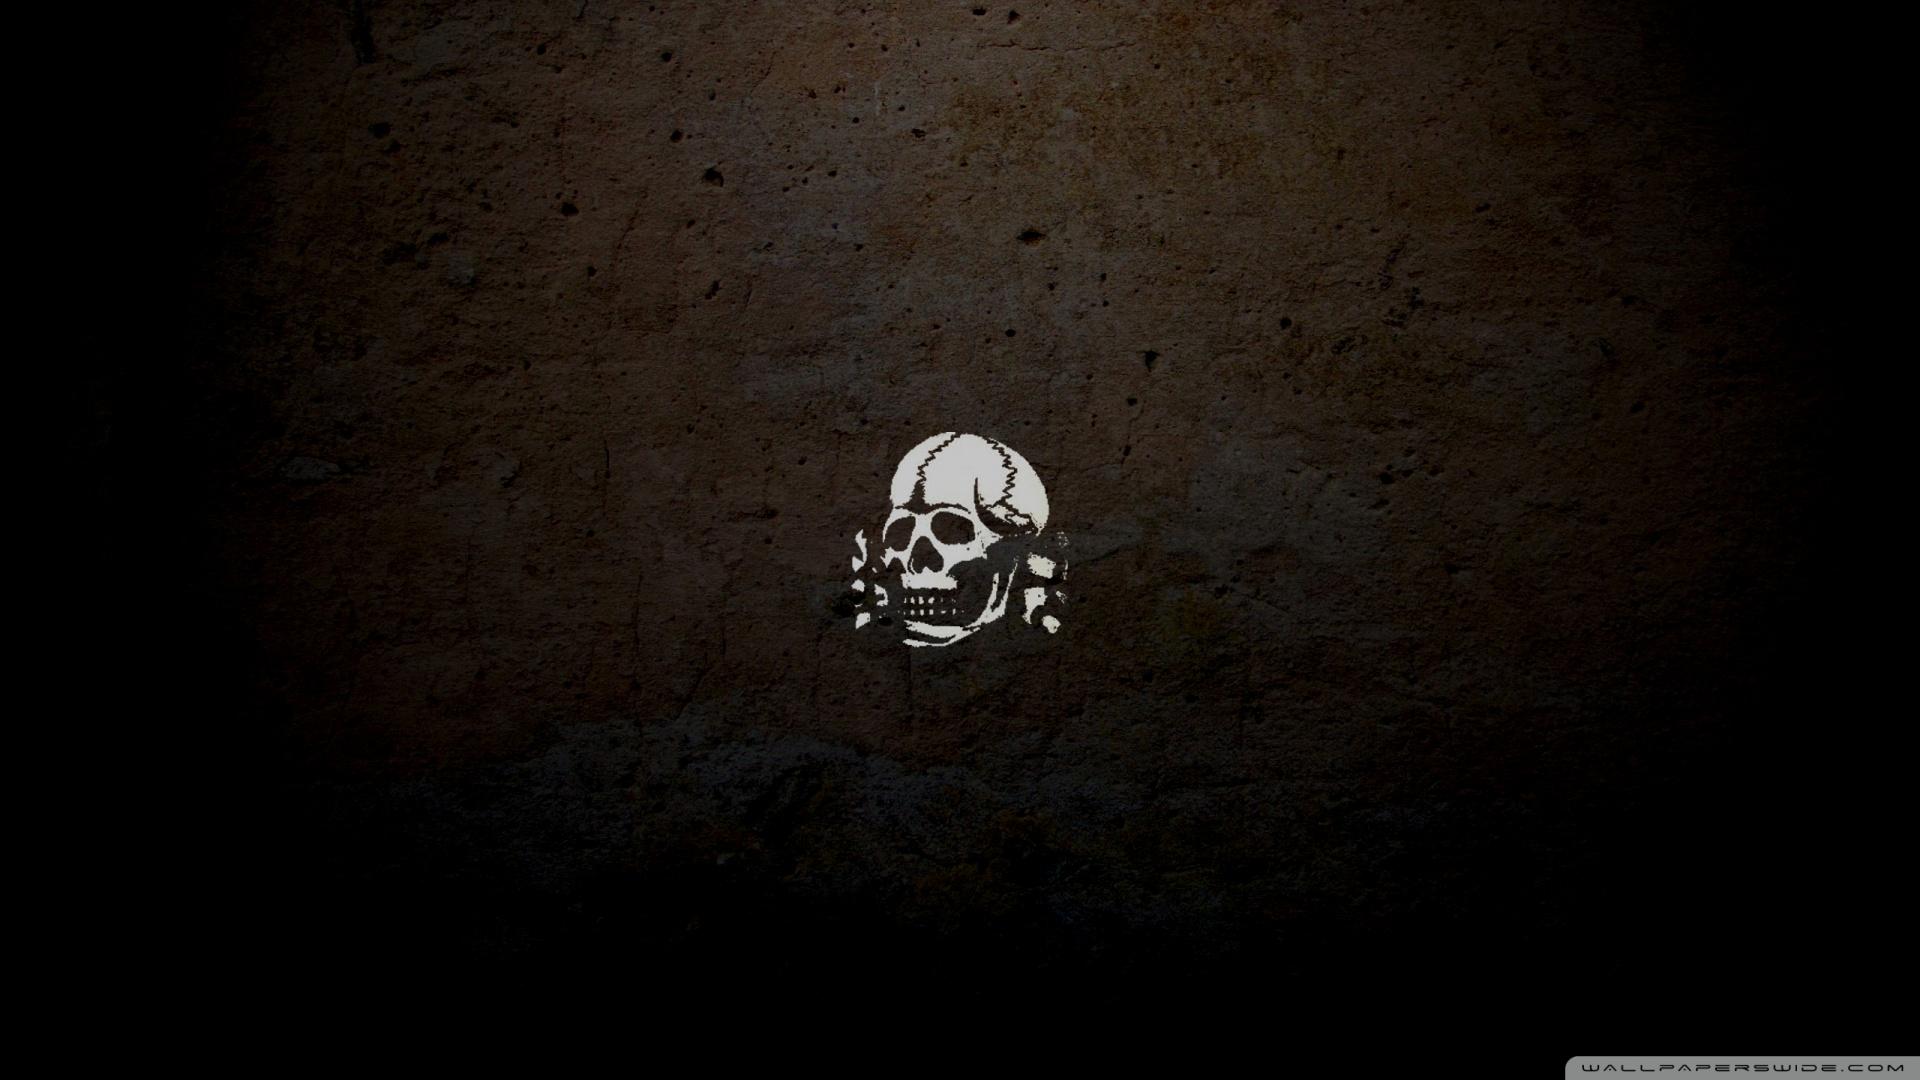 Skull Desktop Wallpaper Related Keywords amp Suggestions 1920x1080